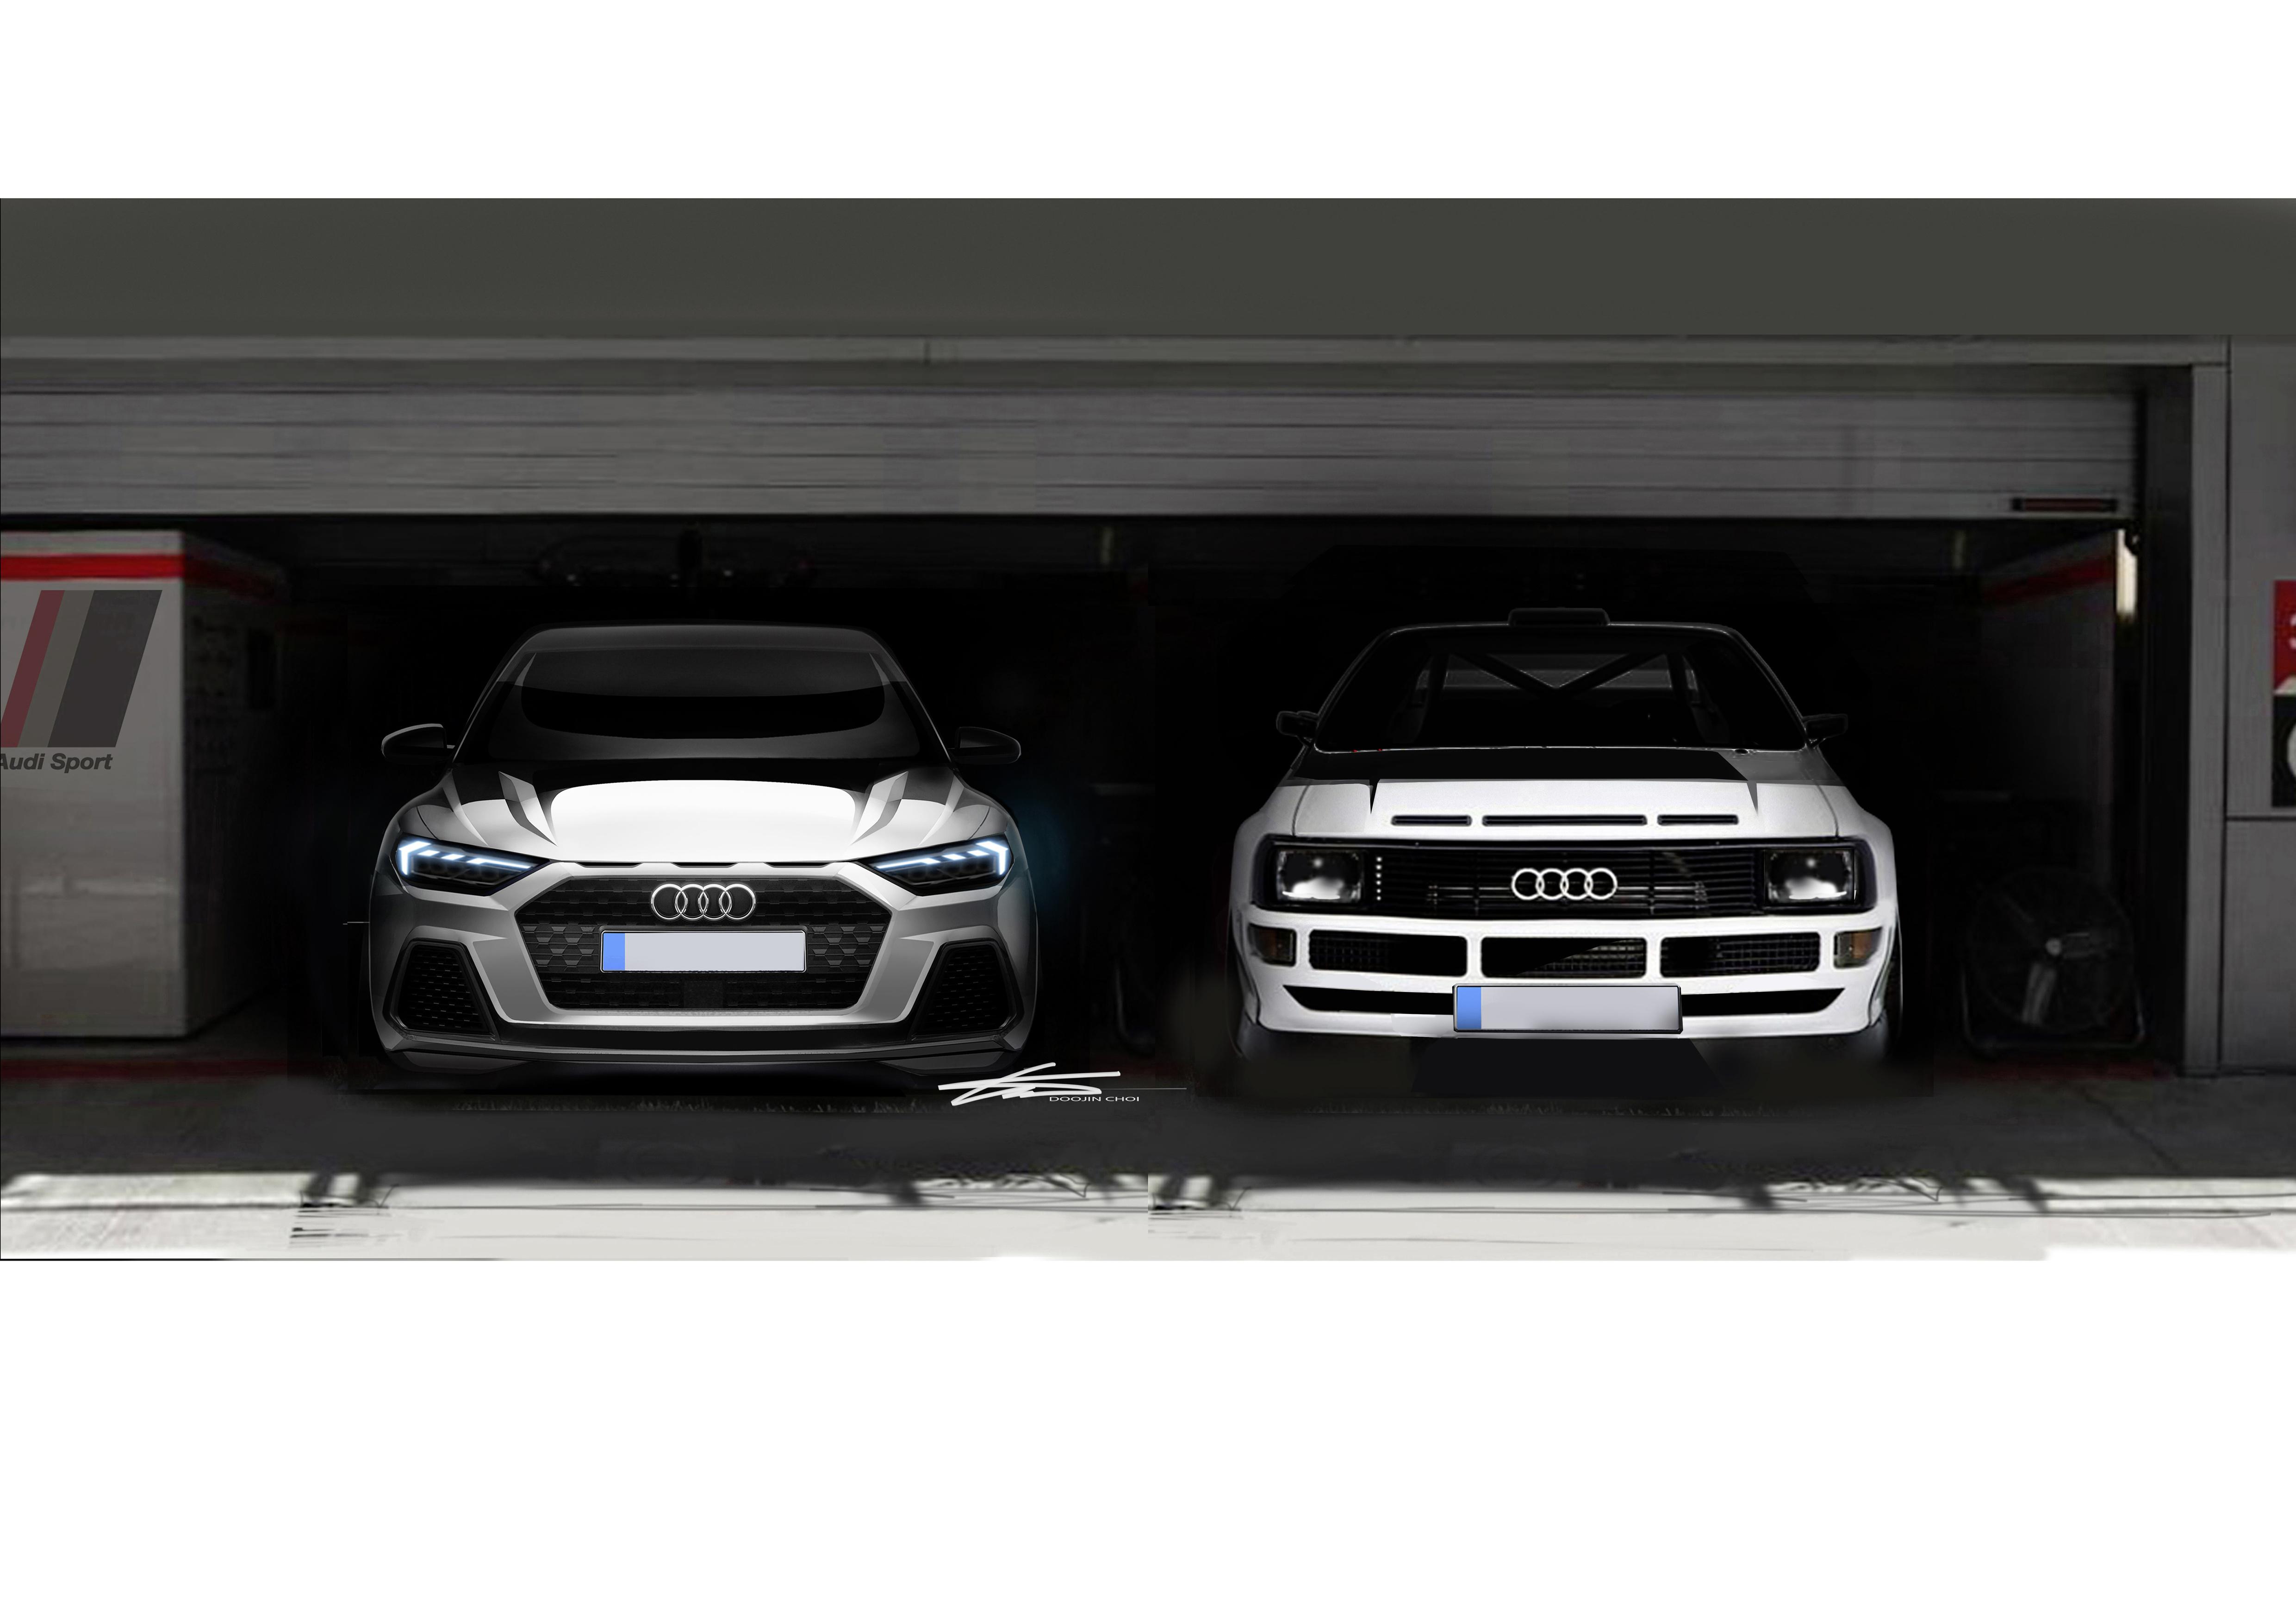 Audi A1 Sportback 2018 : quattro avant l'heure ?